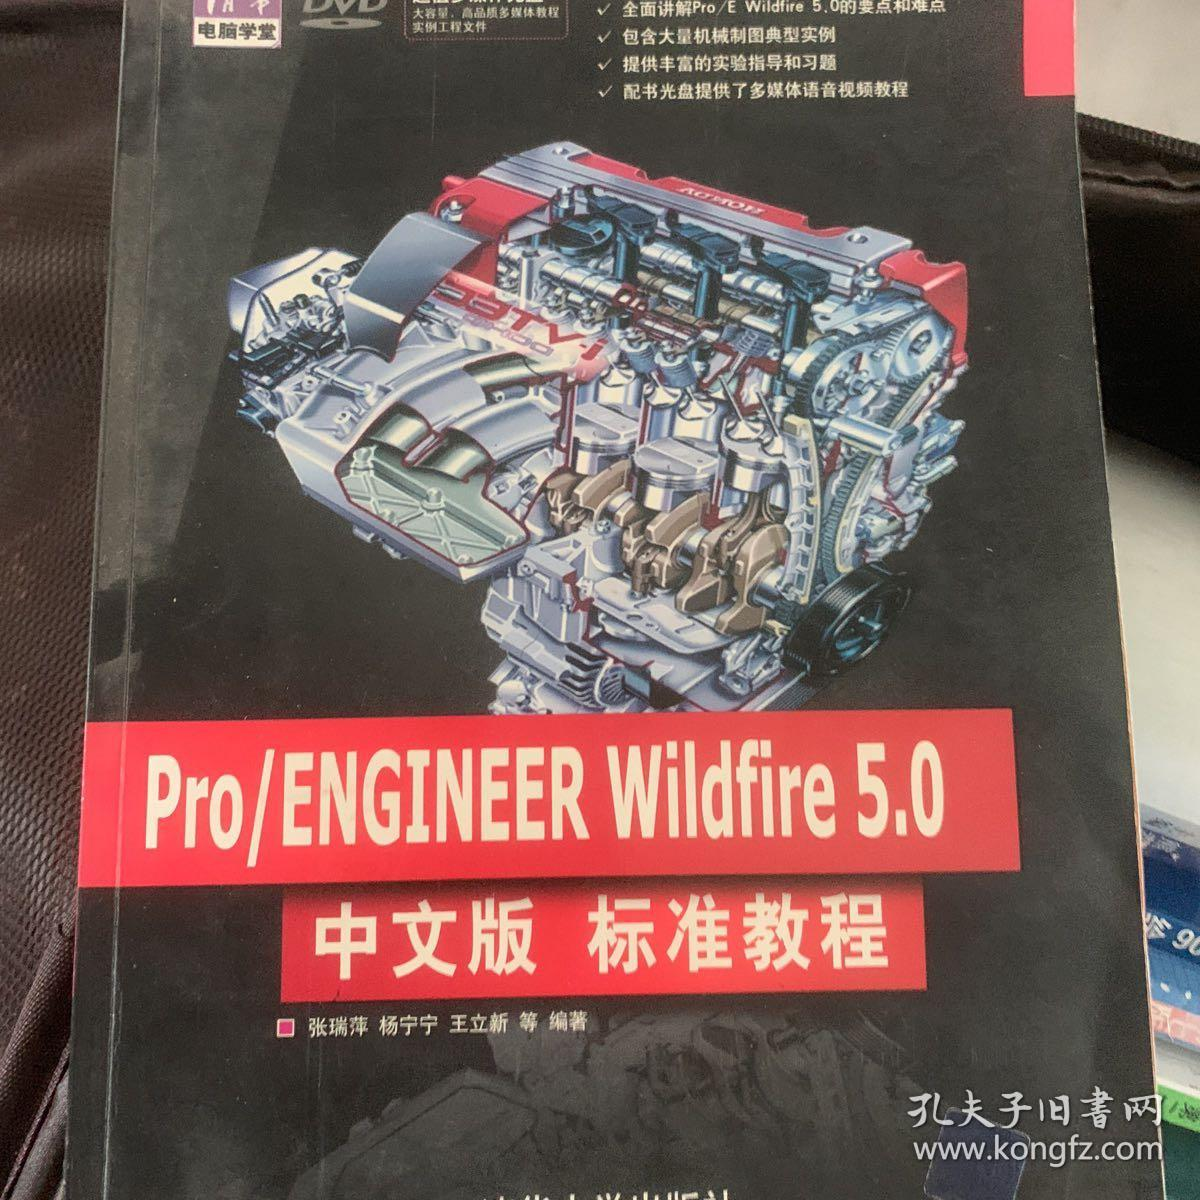 Pro/ENGINEER Wildfire 5.0中文版标准教程